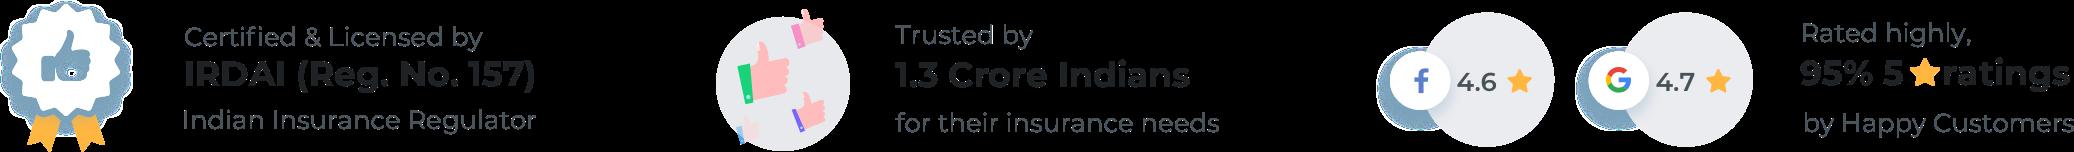 Acko General Insurance | blog